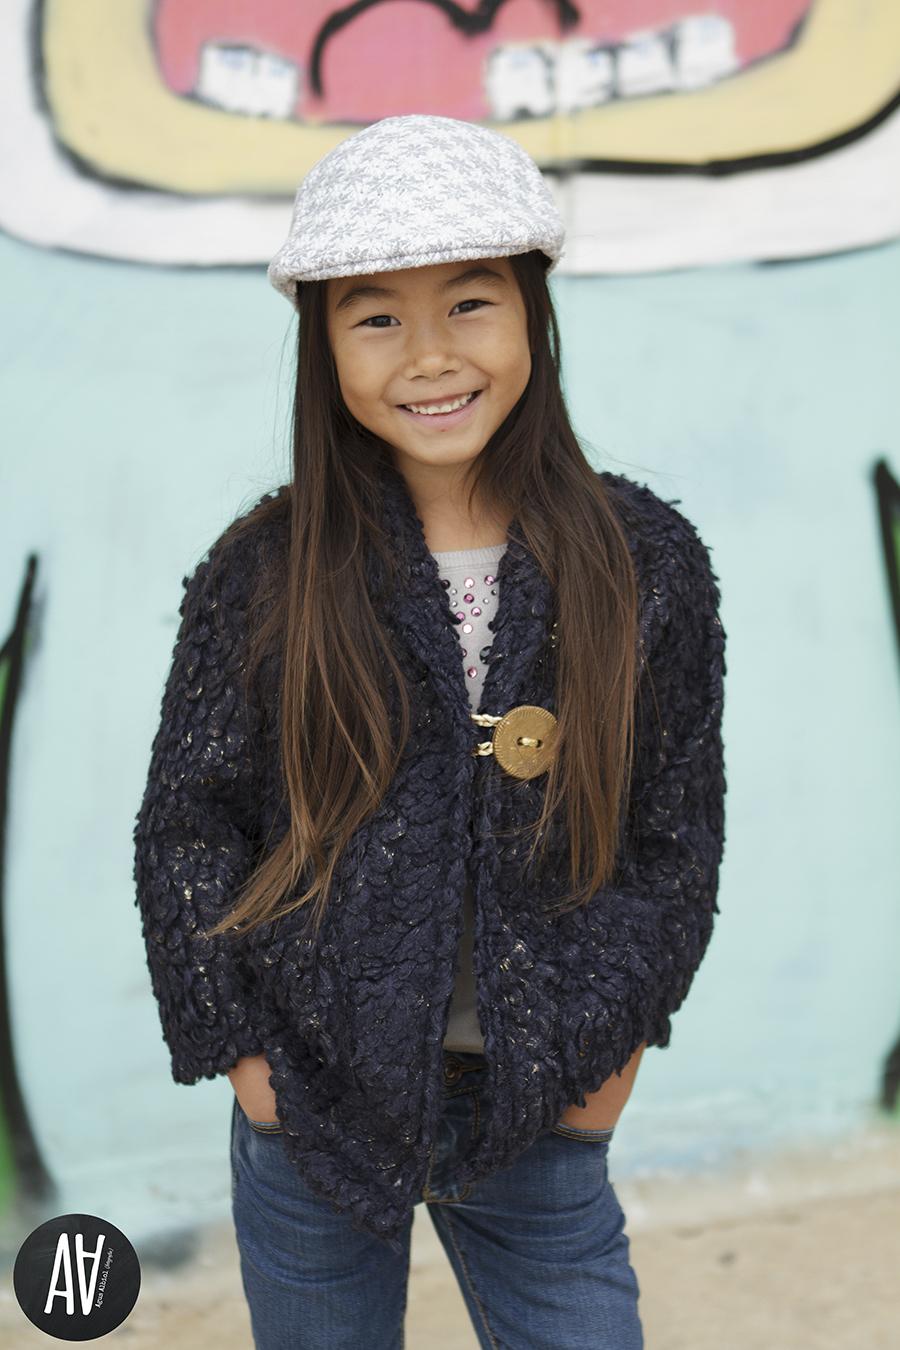 Agus Albiol Fotografia fotografa de moda street style trends & fashion mini Barcelona Elisabeth Puig ropa niños.3